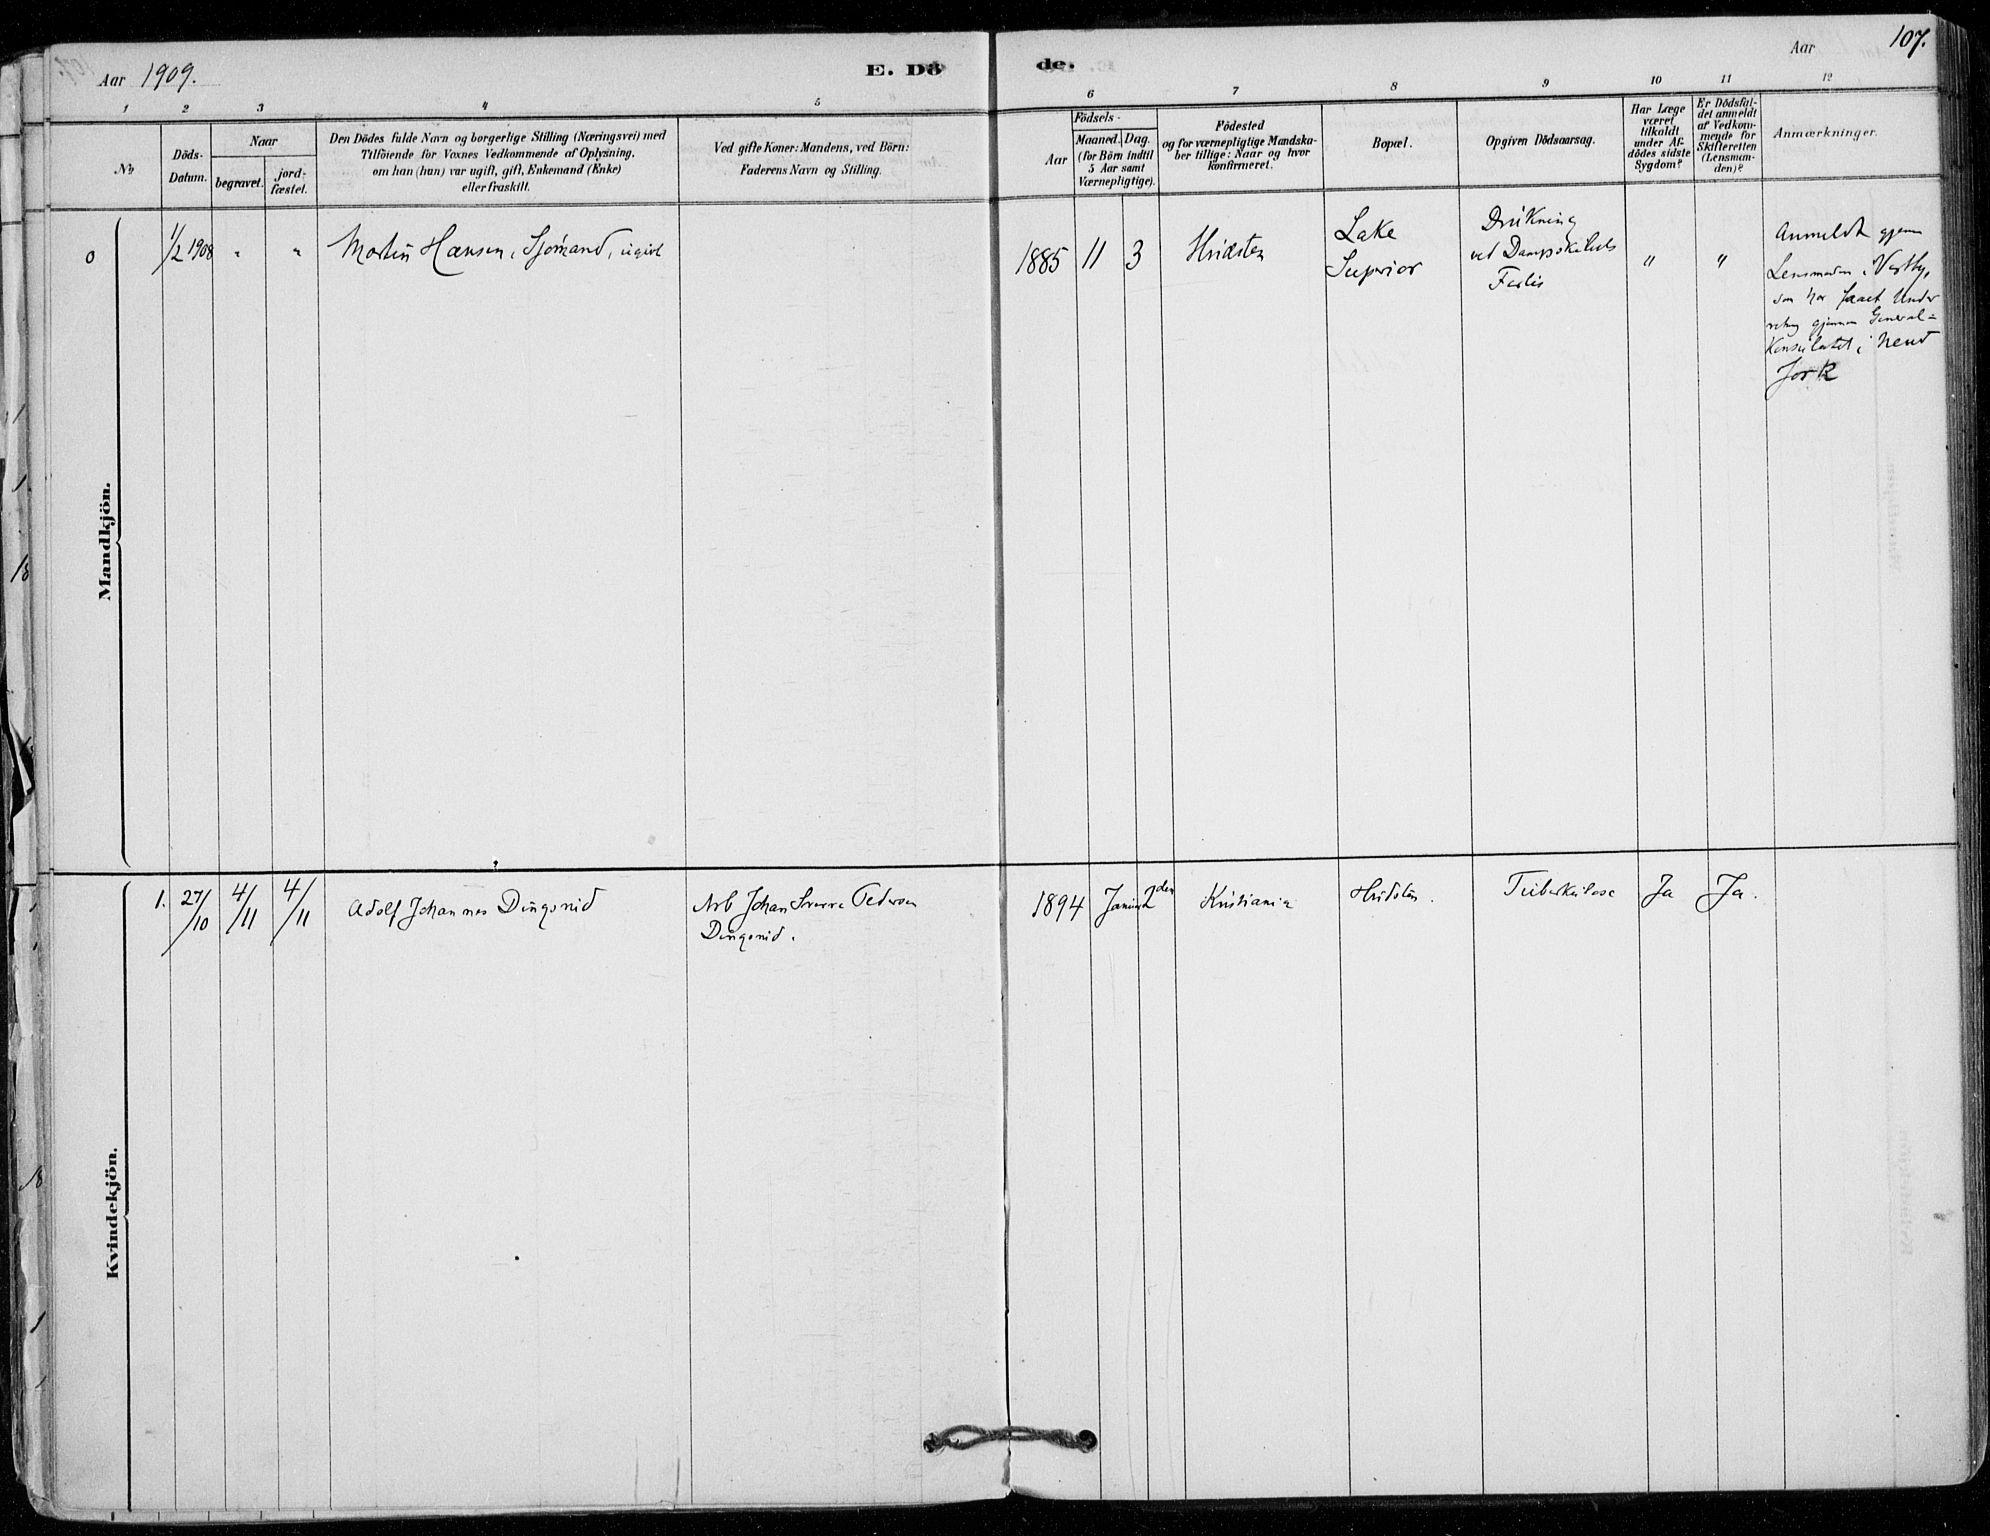 SAO, Vestby prestekontor Kirkebøker, F/Fd/L0001: Ministerialbok nr. IV 1, 1878-1945, s. 107